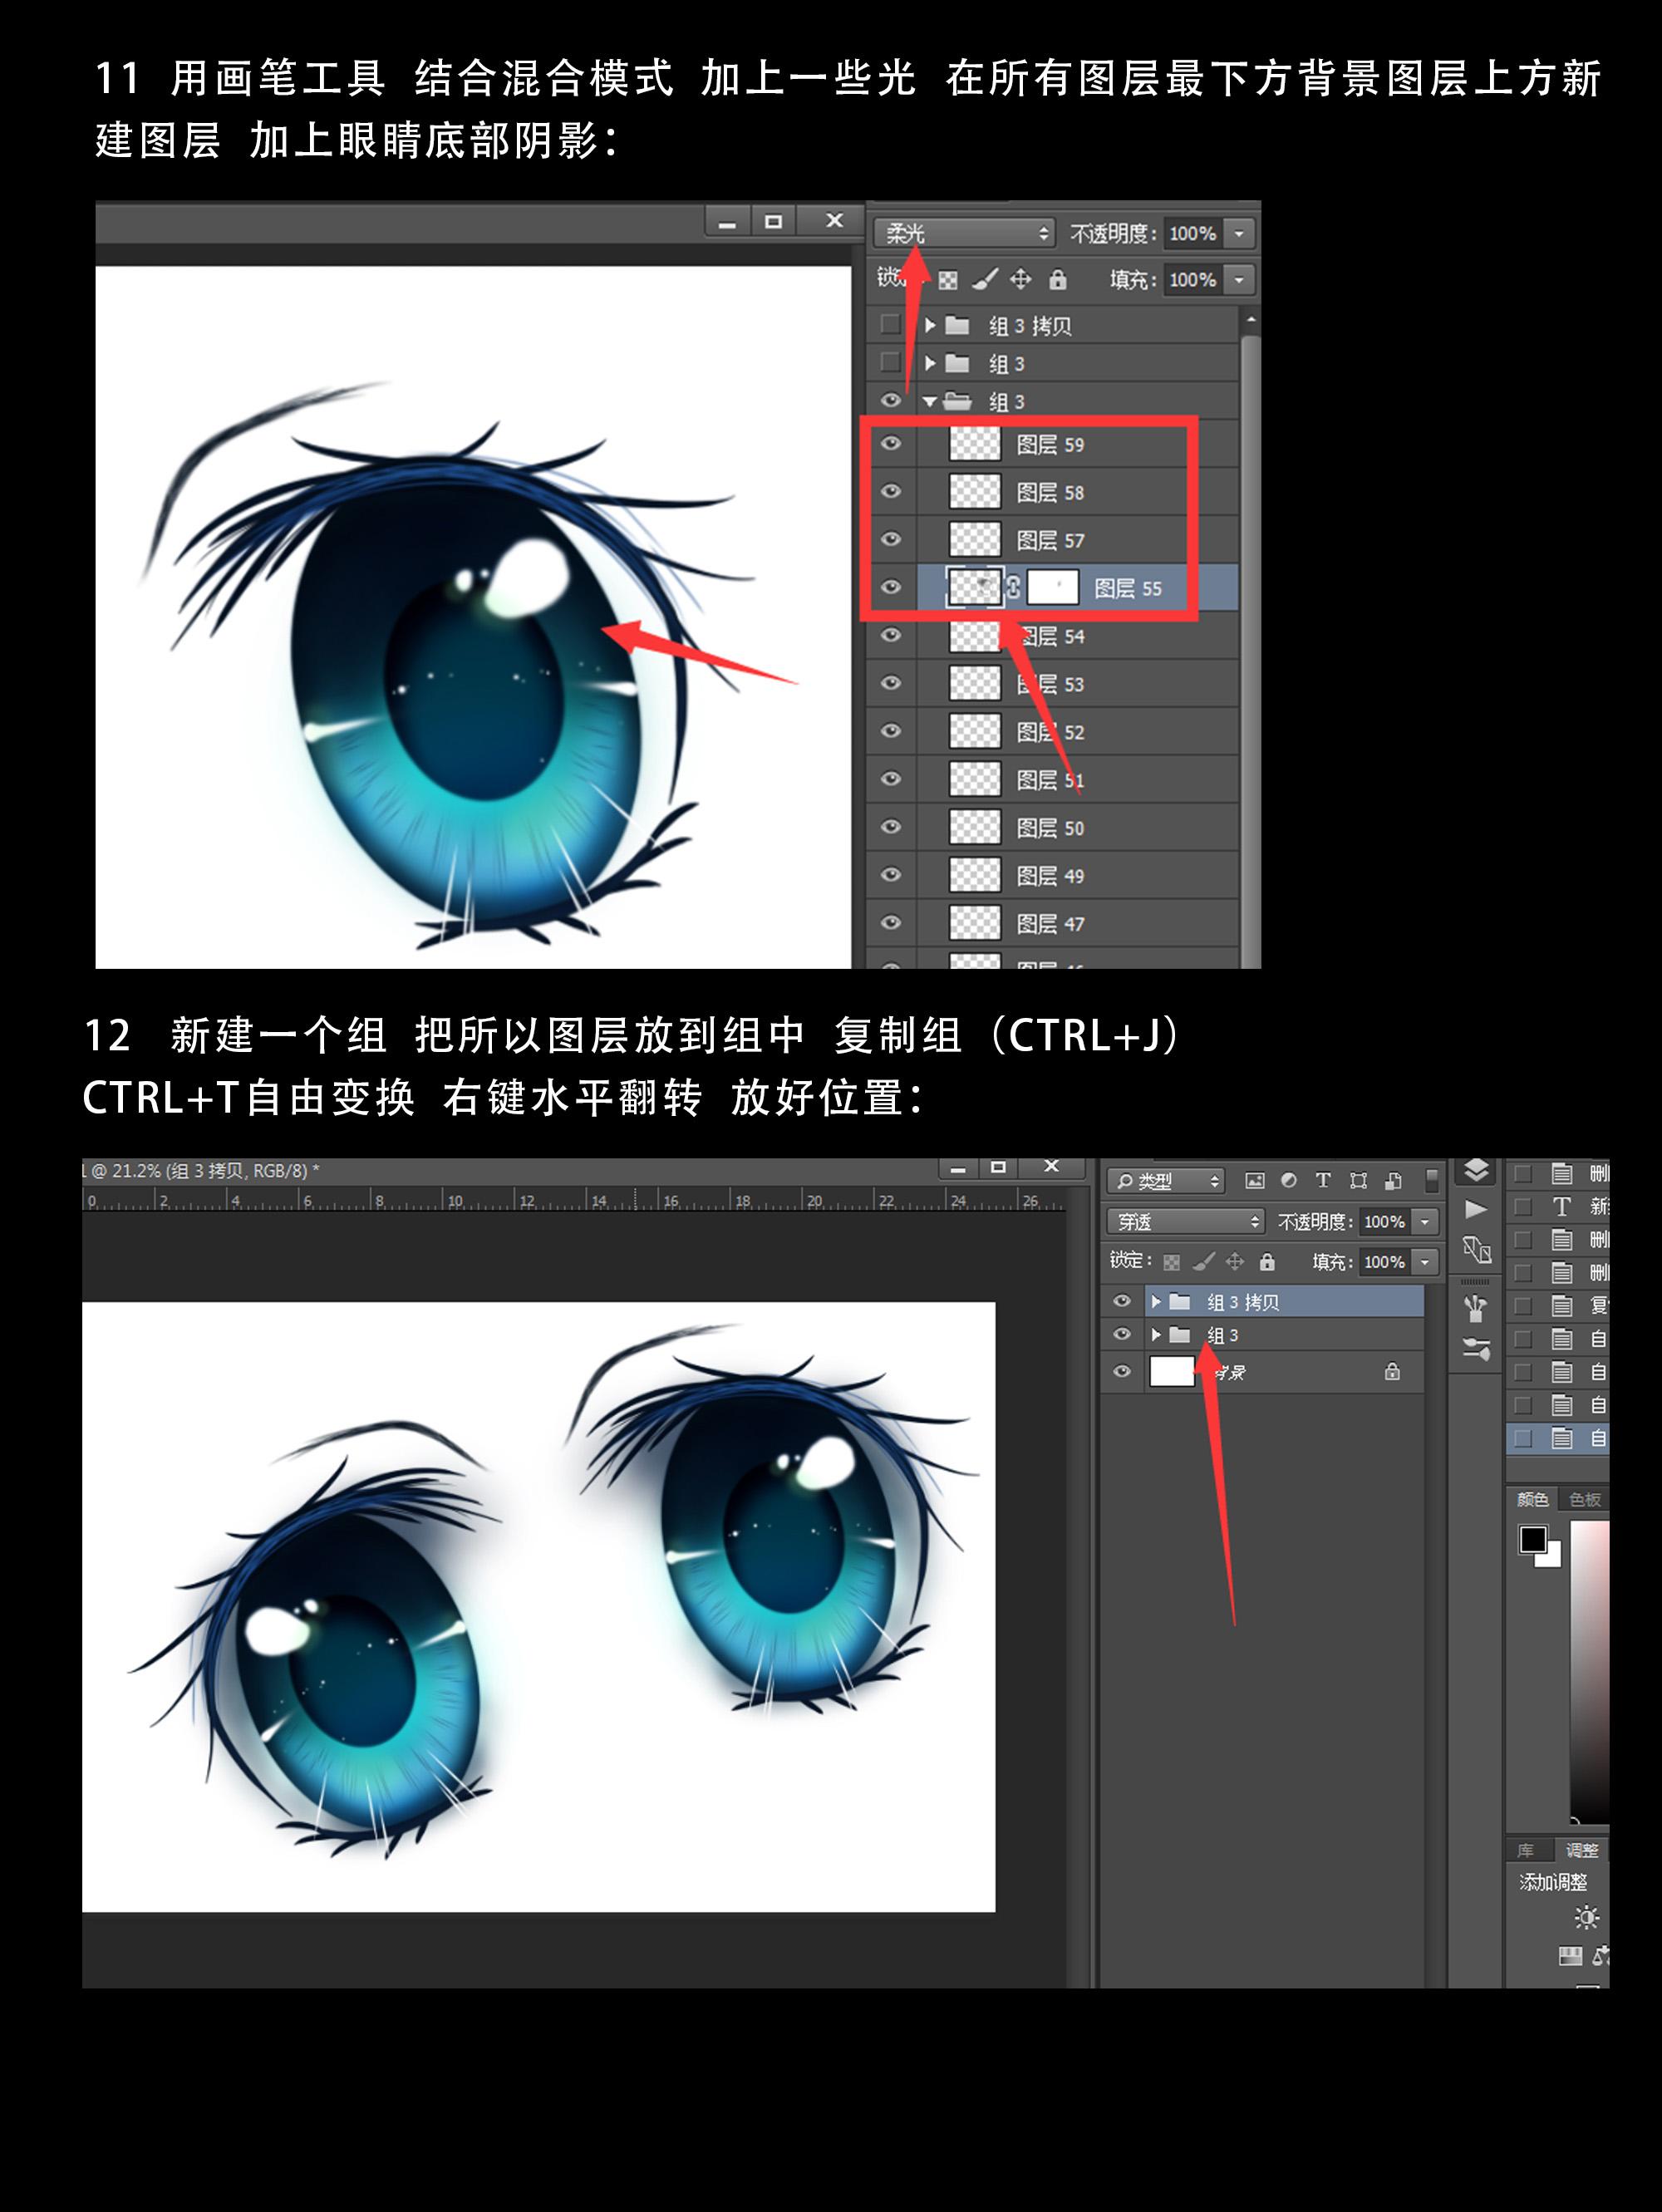 Photoshop鼠繪卡通風格的大眼睛效果